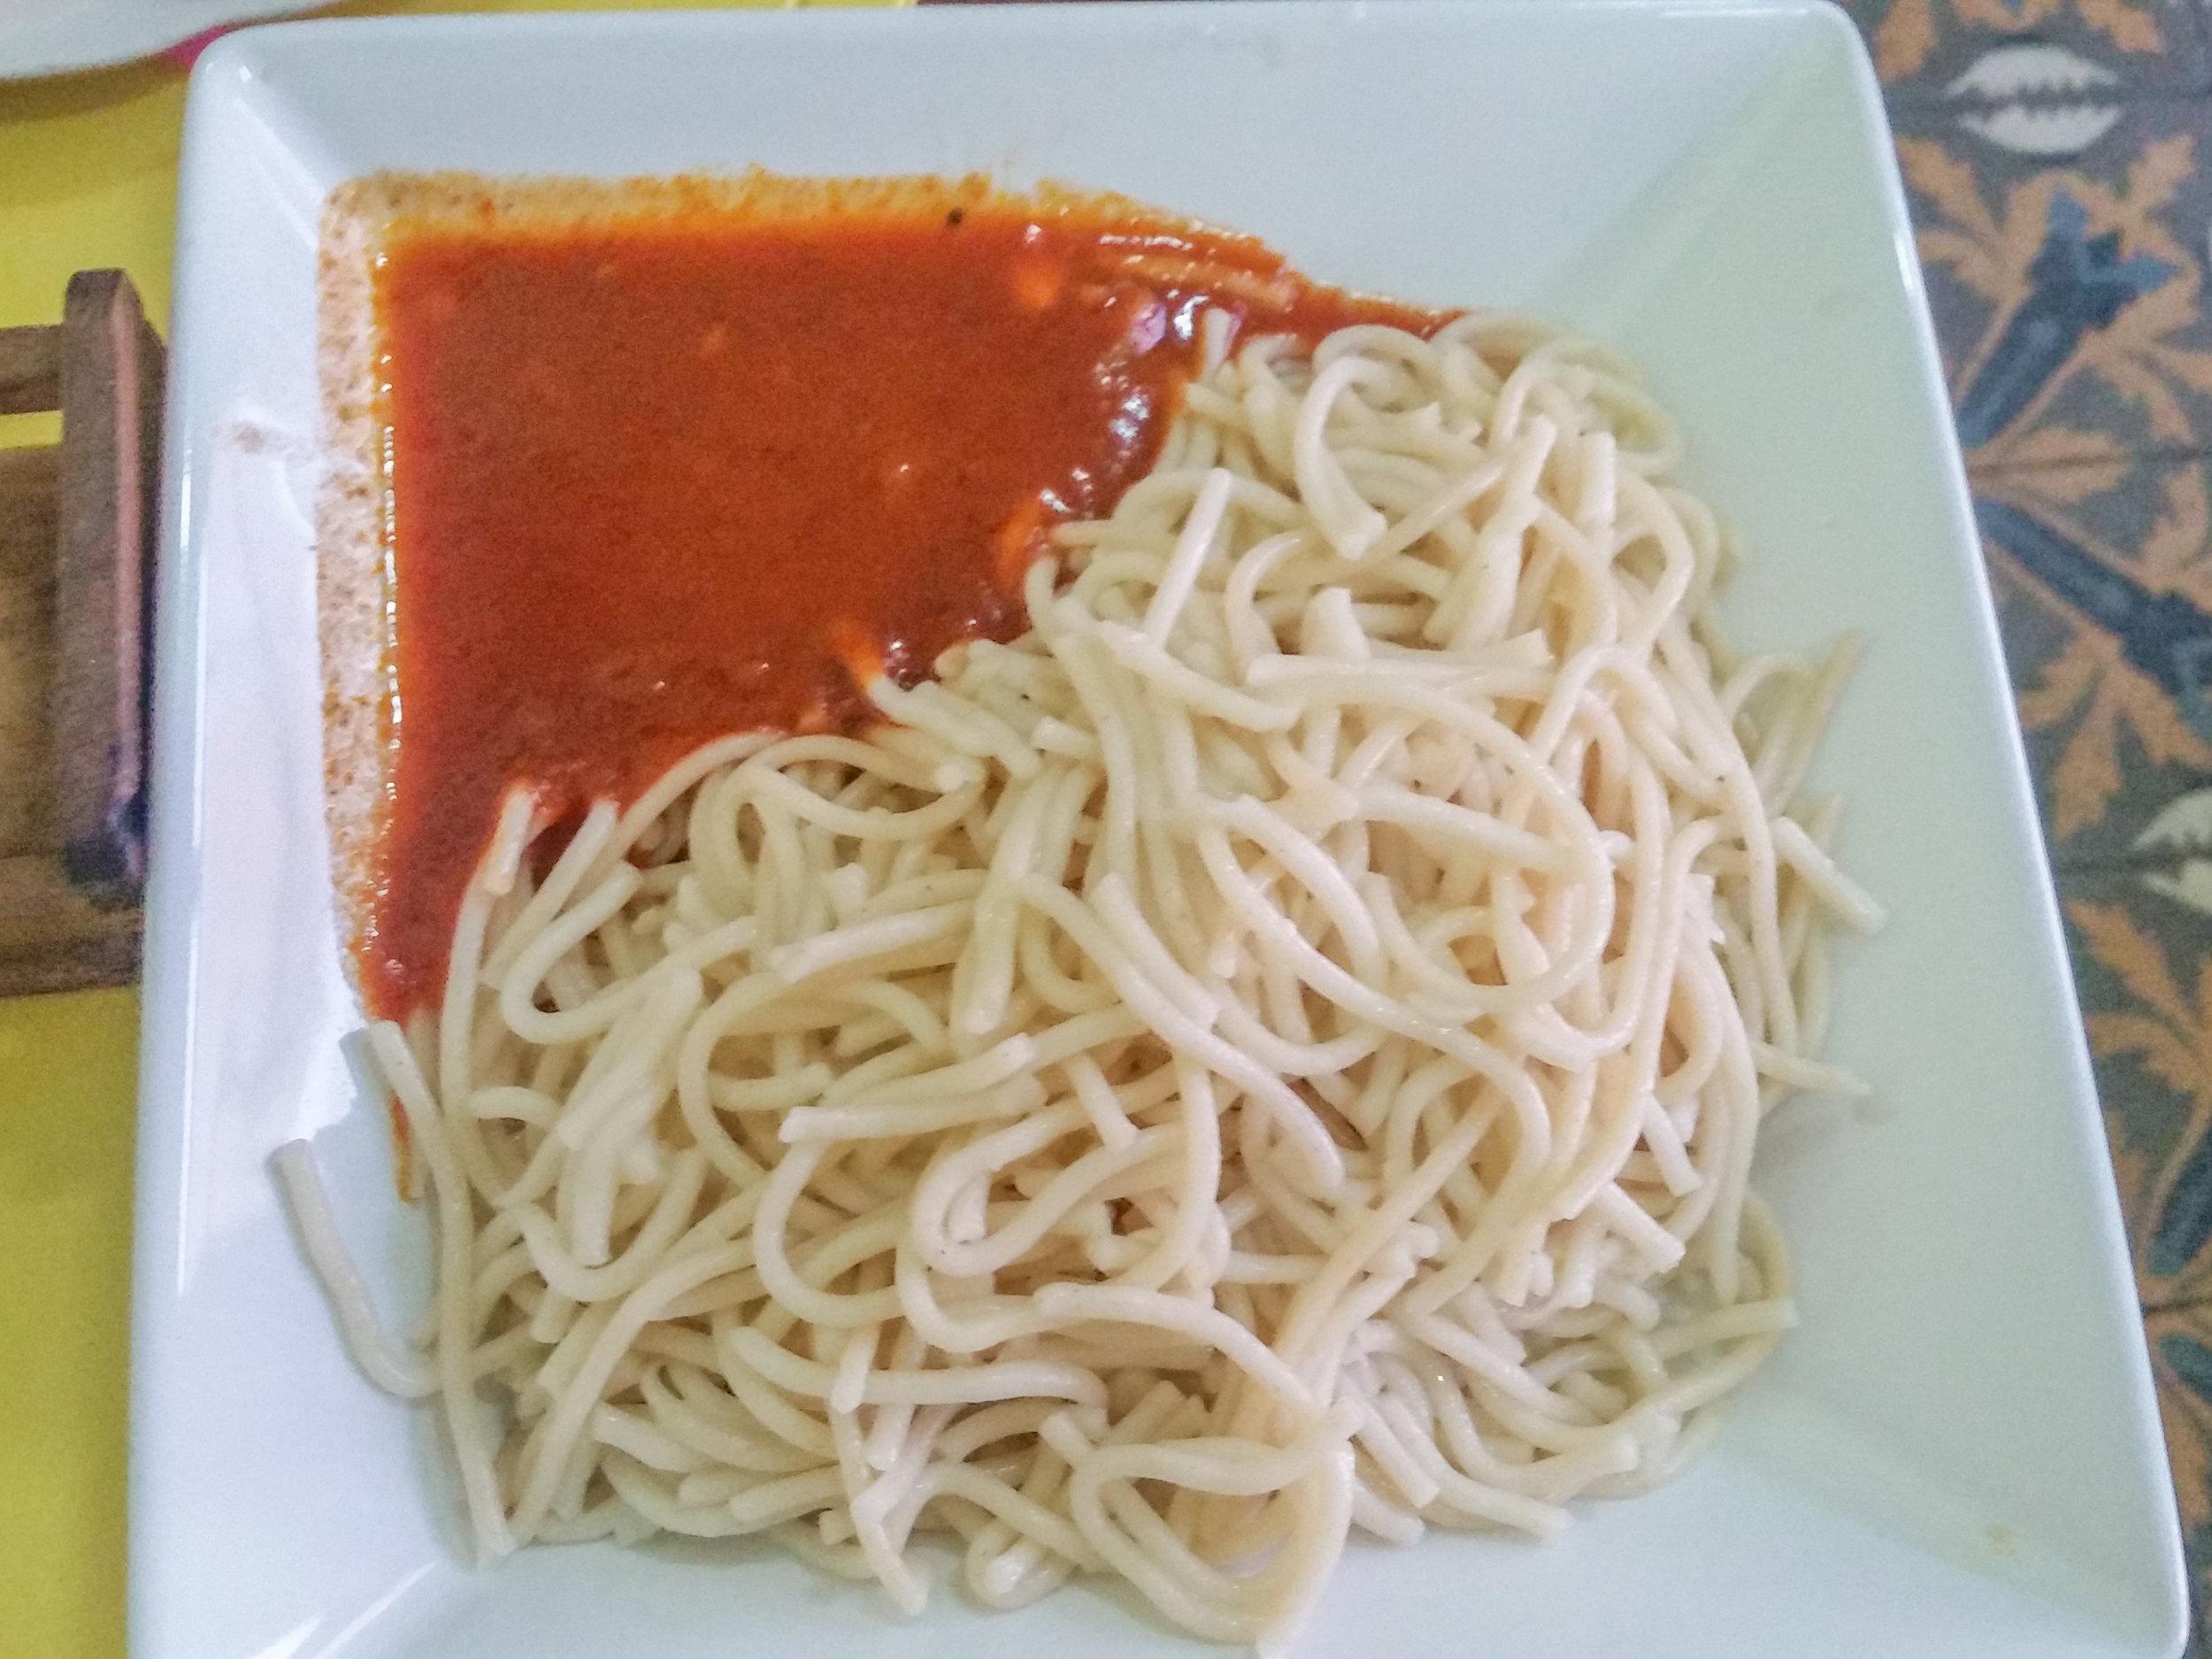 More Cuban spaghetti